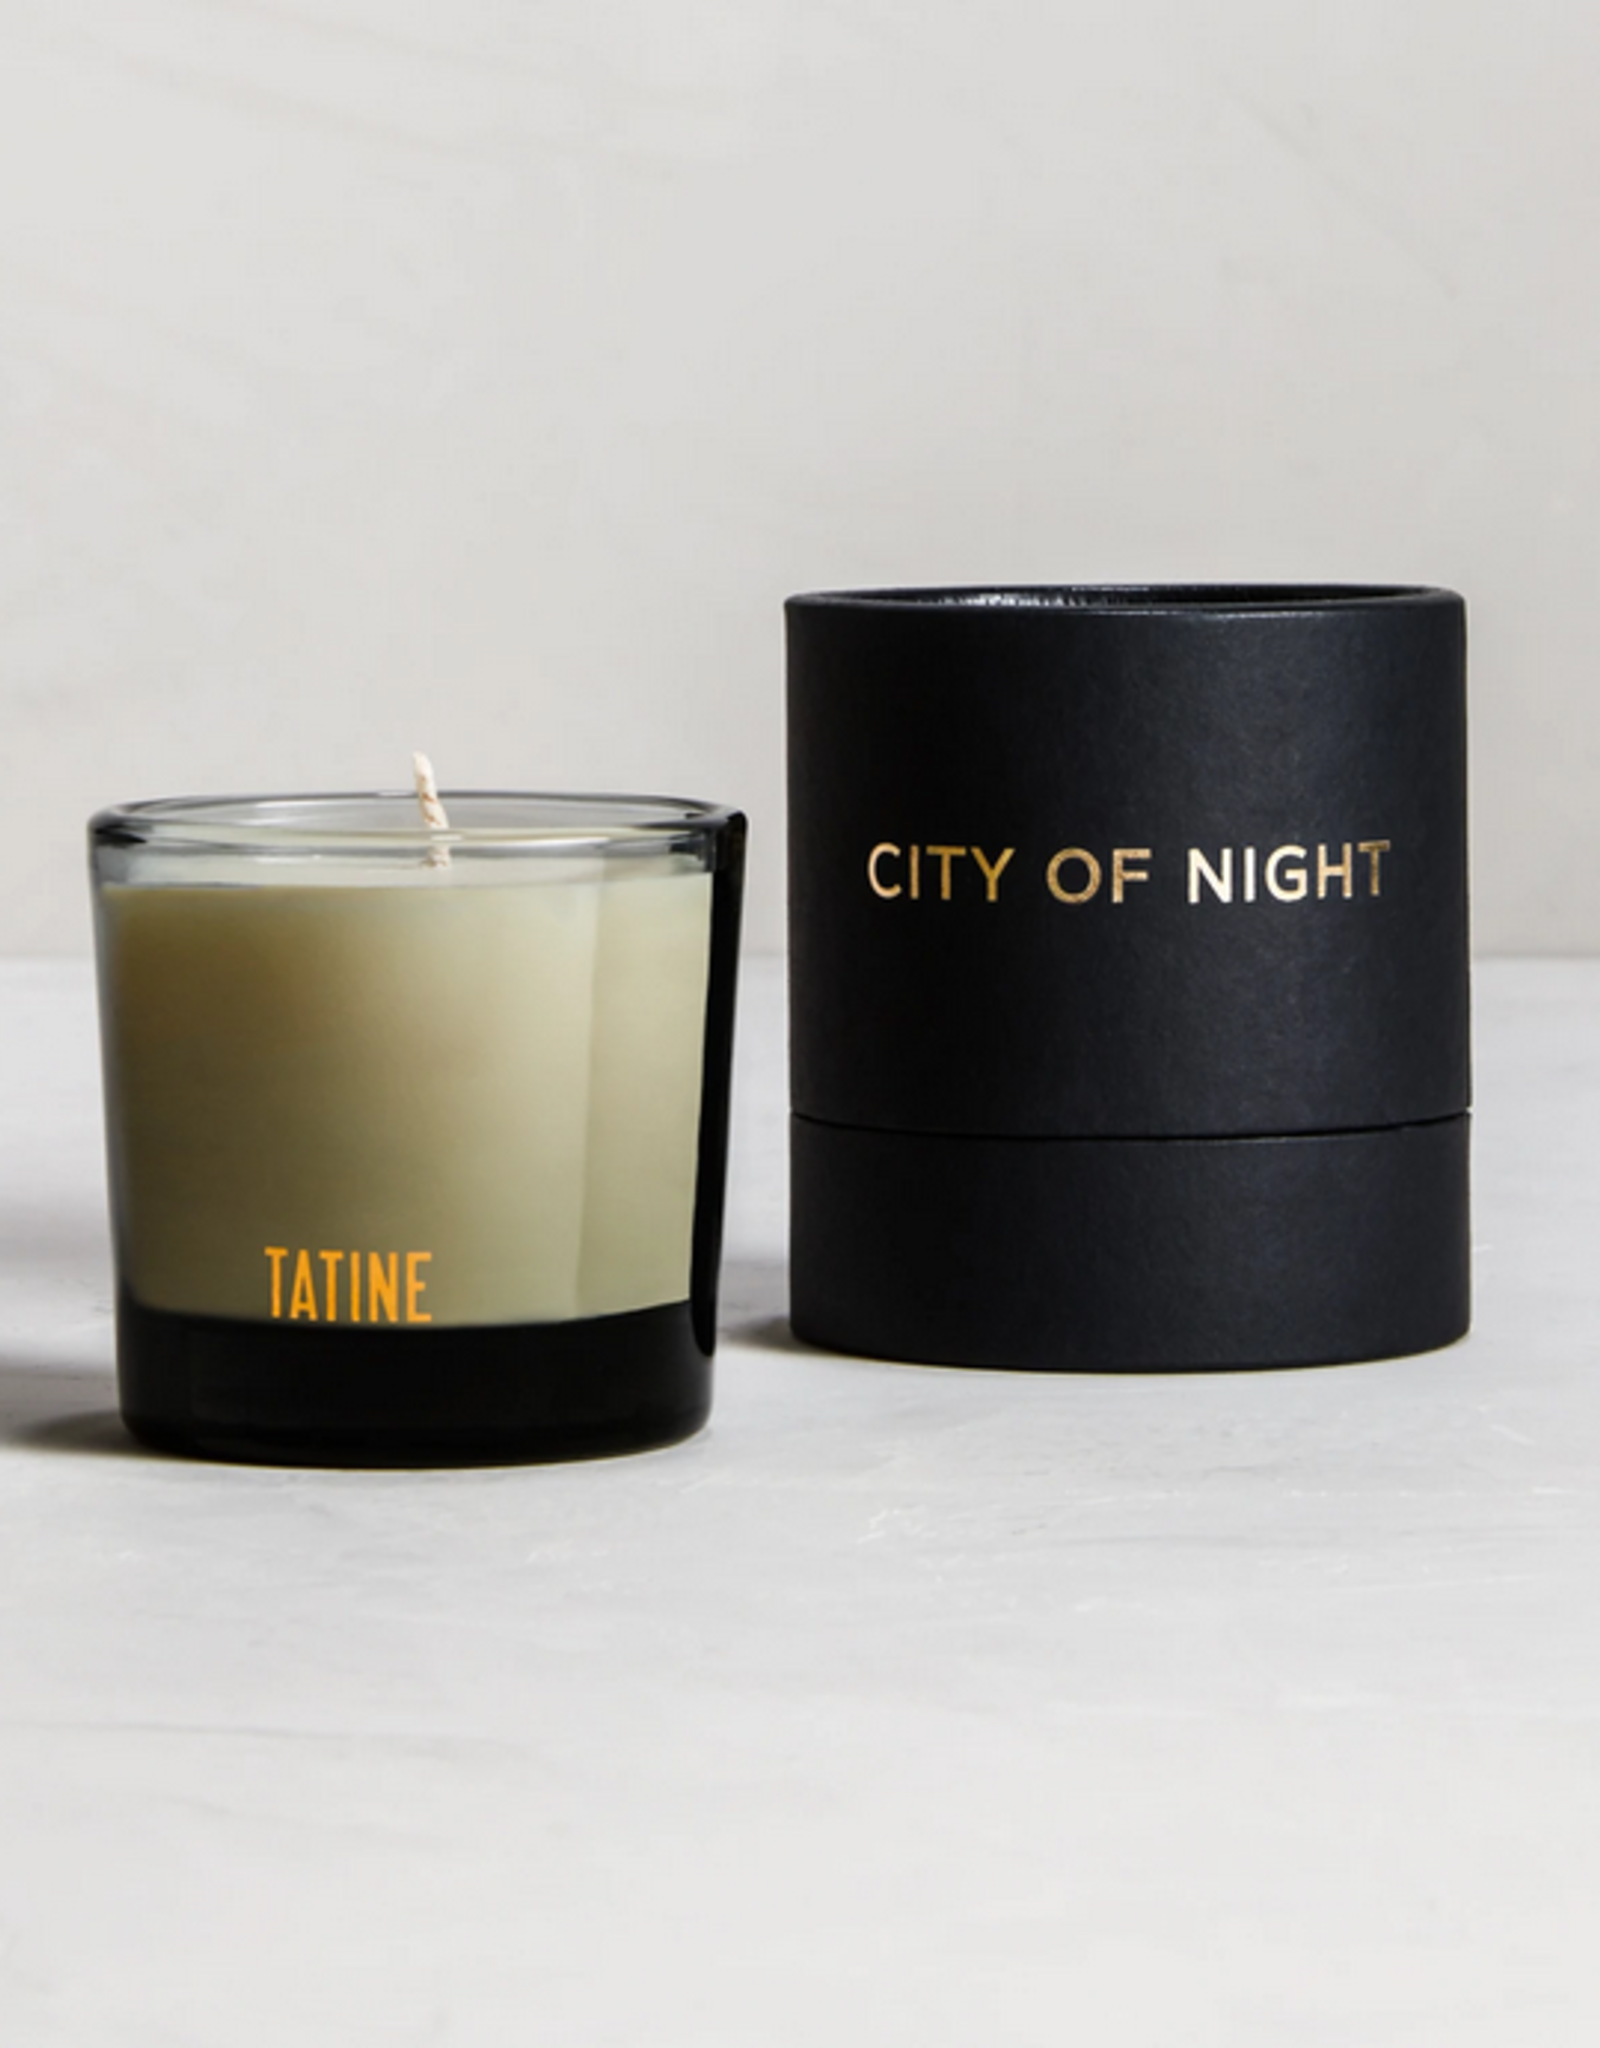 Tatine Dark, Wild, + Deep - City of Night